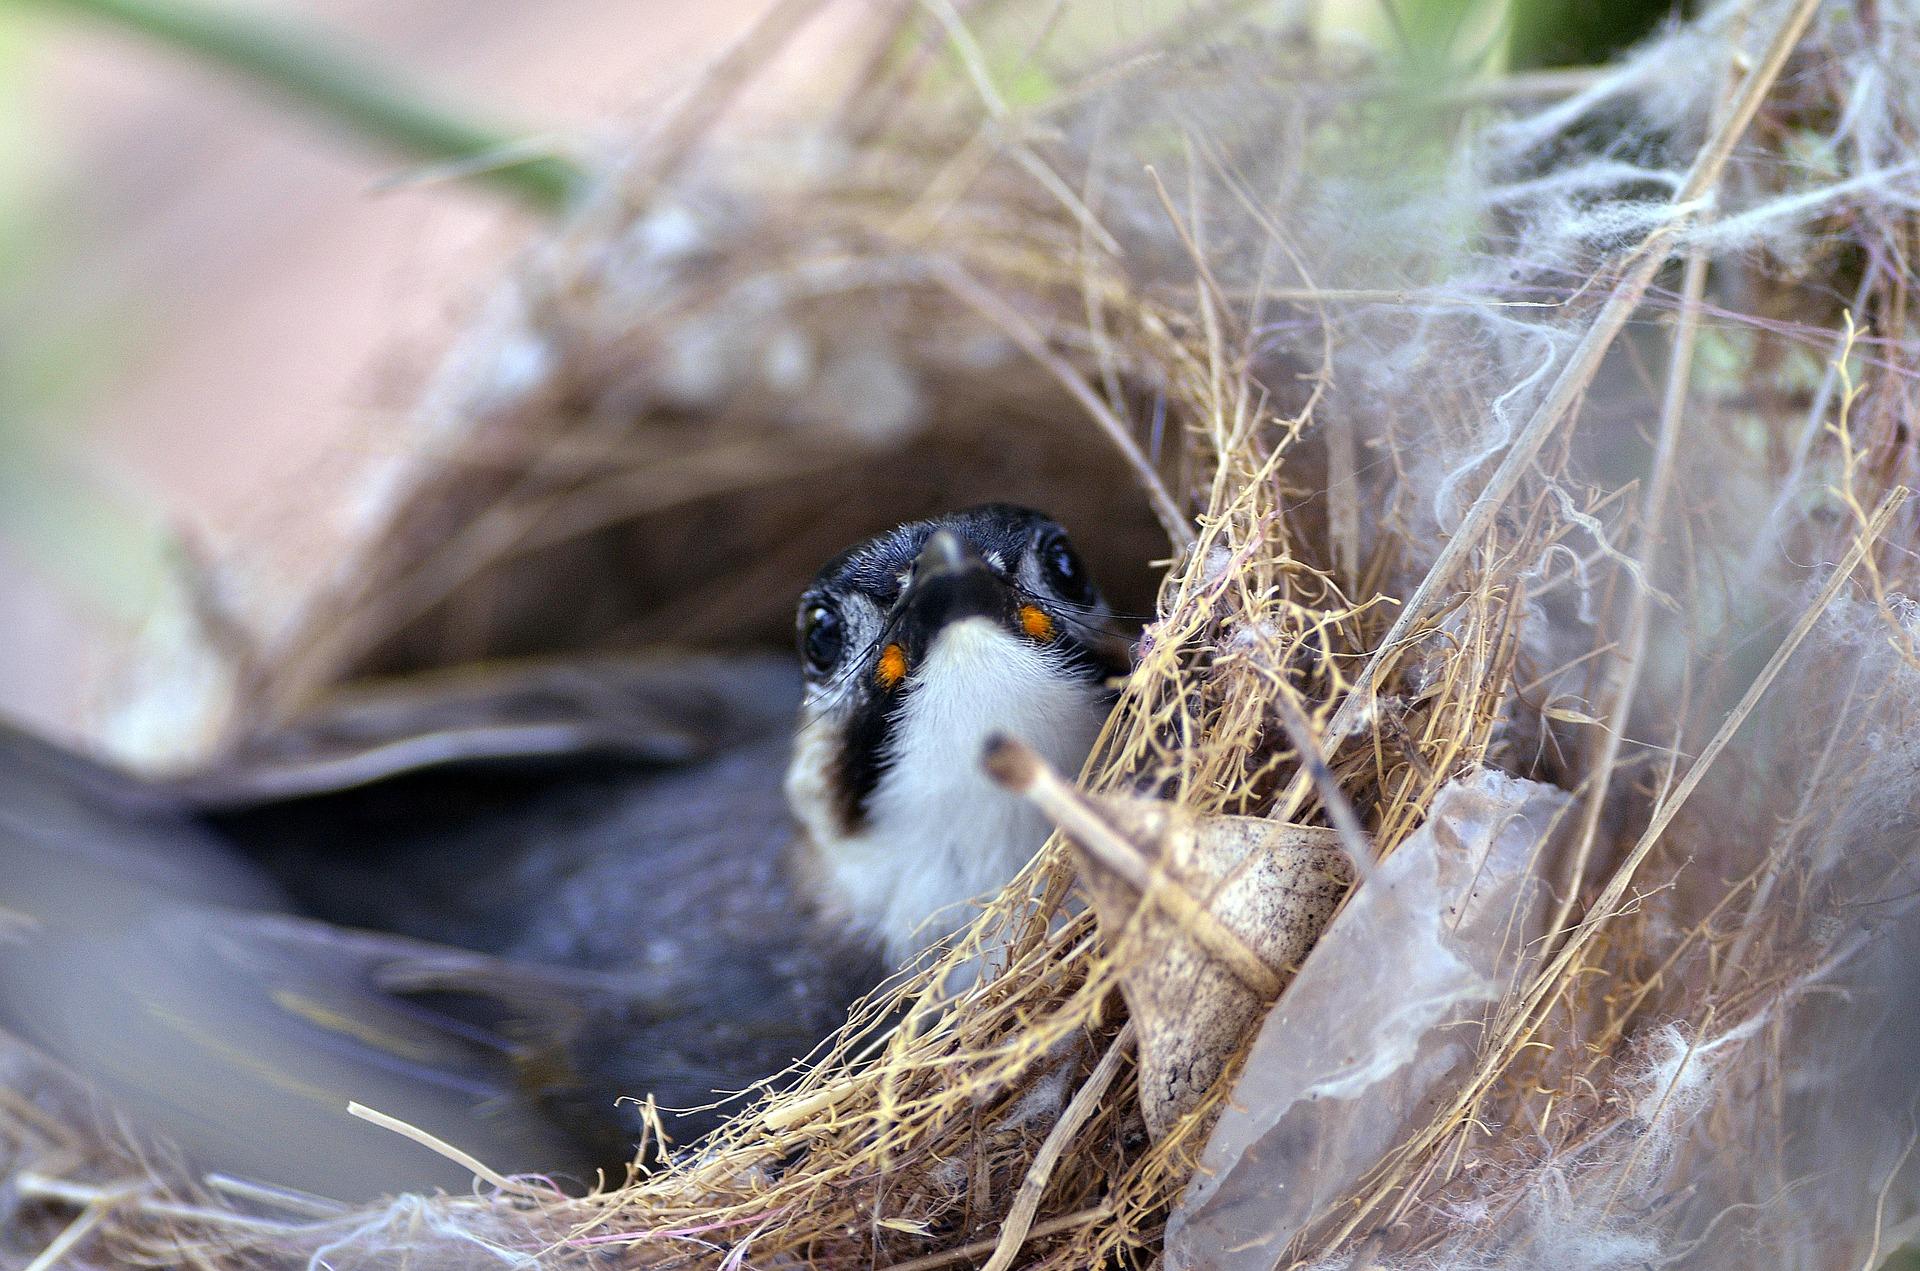 Suka Mengamati Hewan Liar Seperti Burung, Anda Harus Mengenal Tehnik Berikut